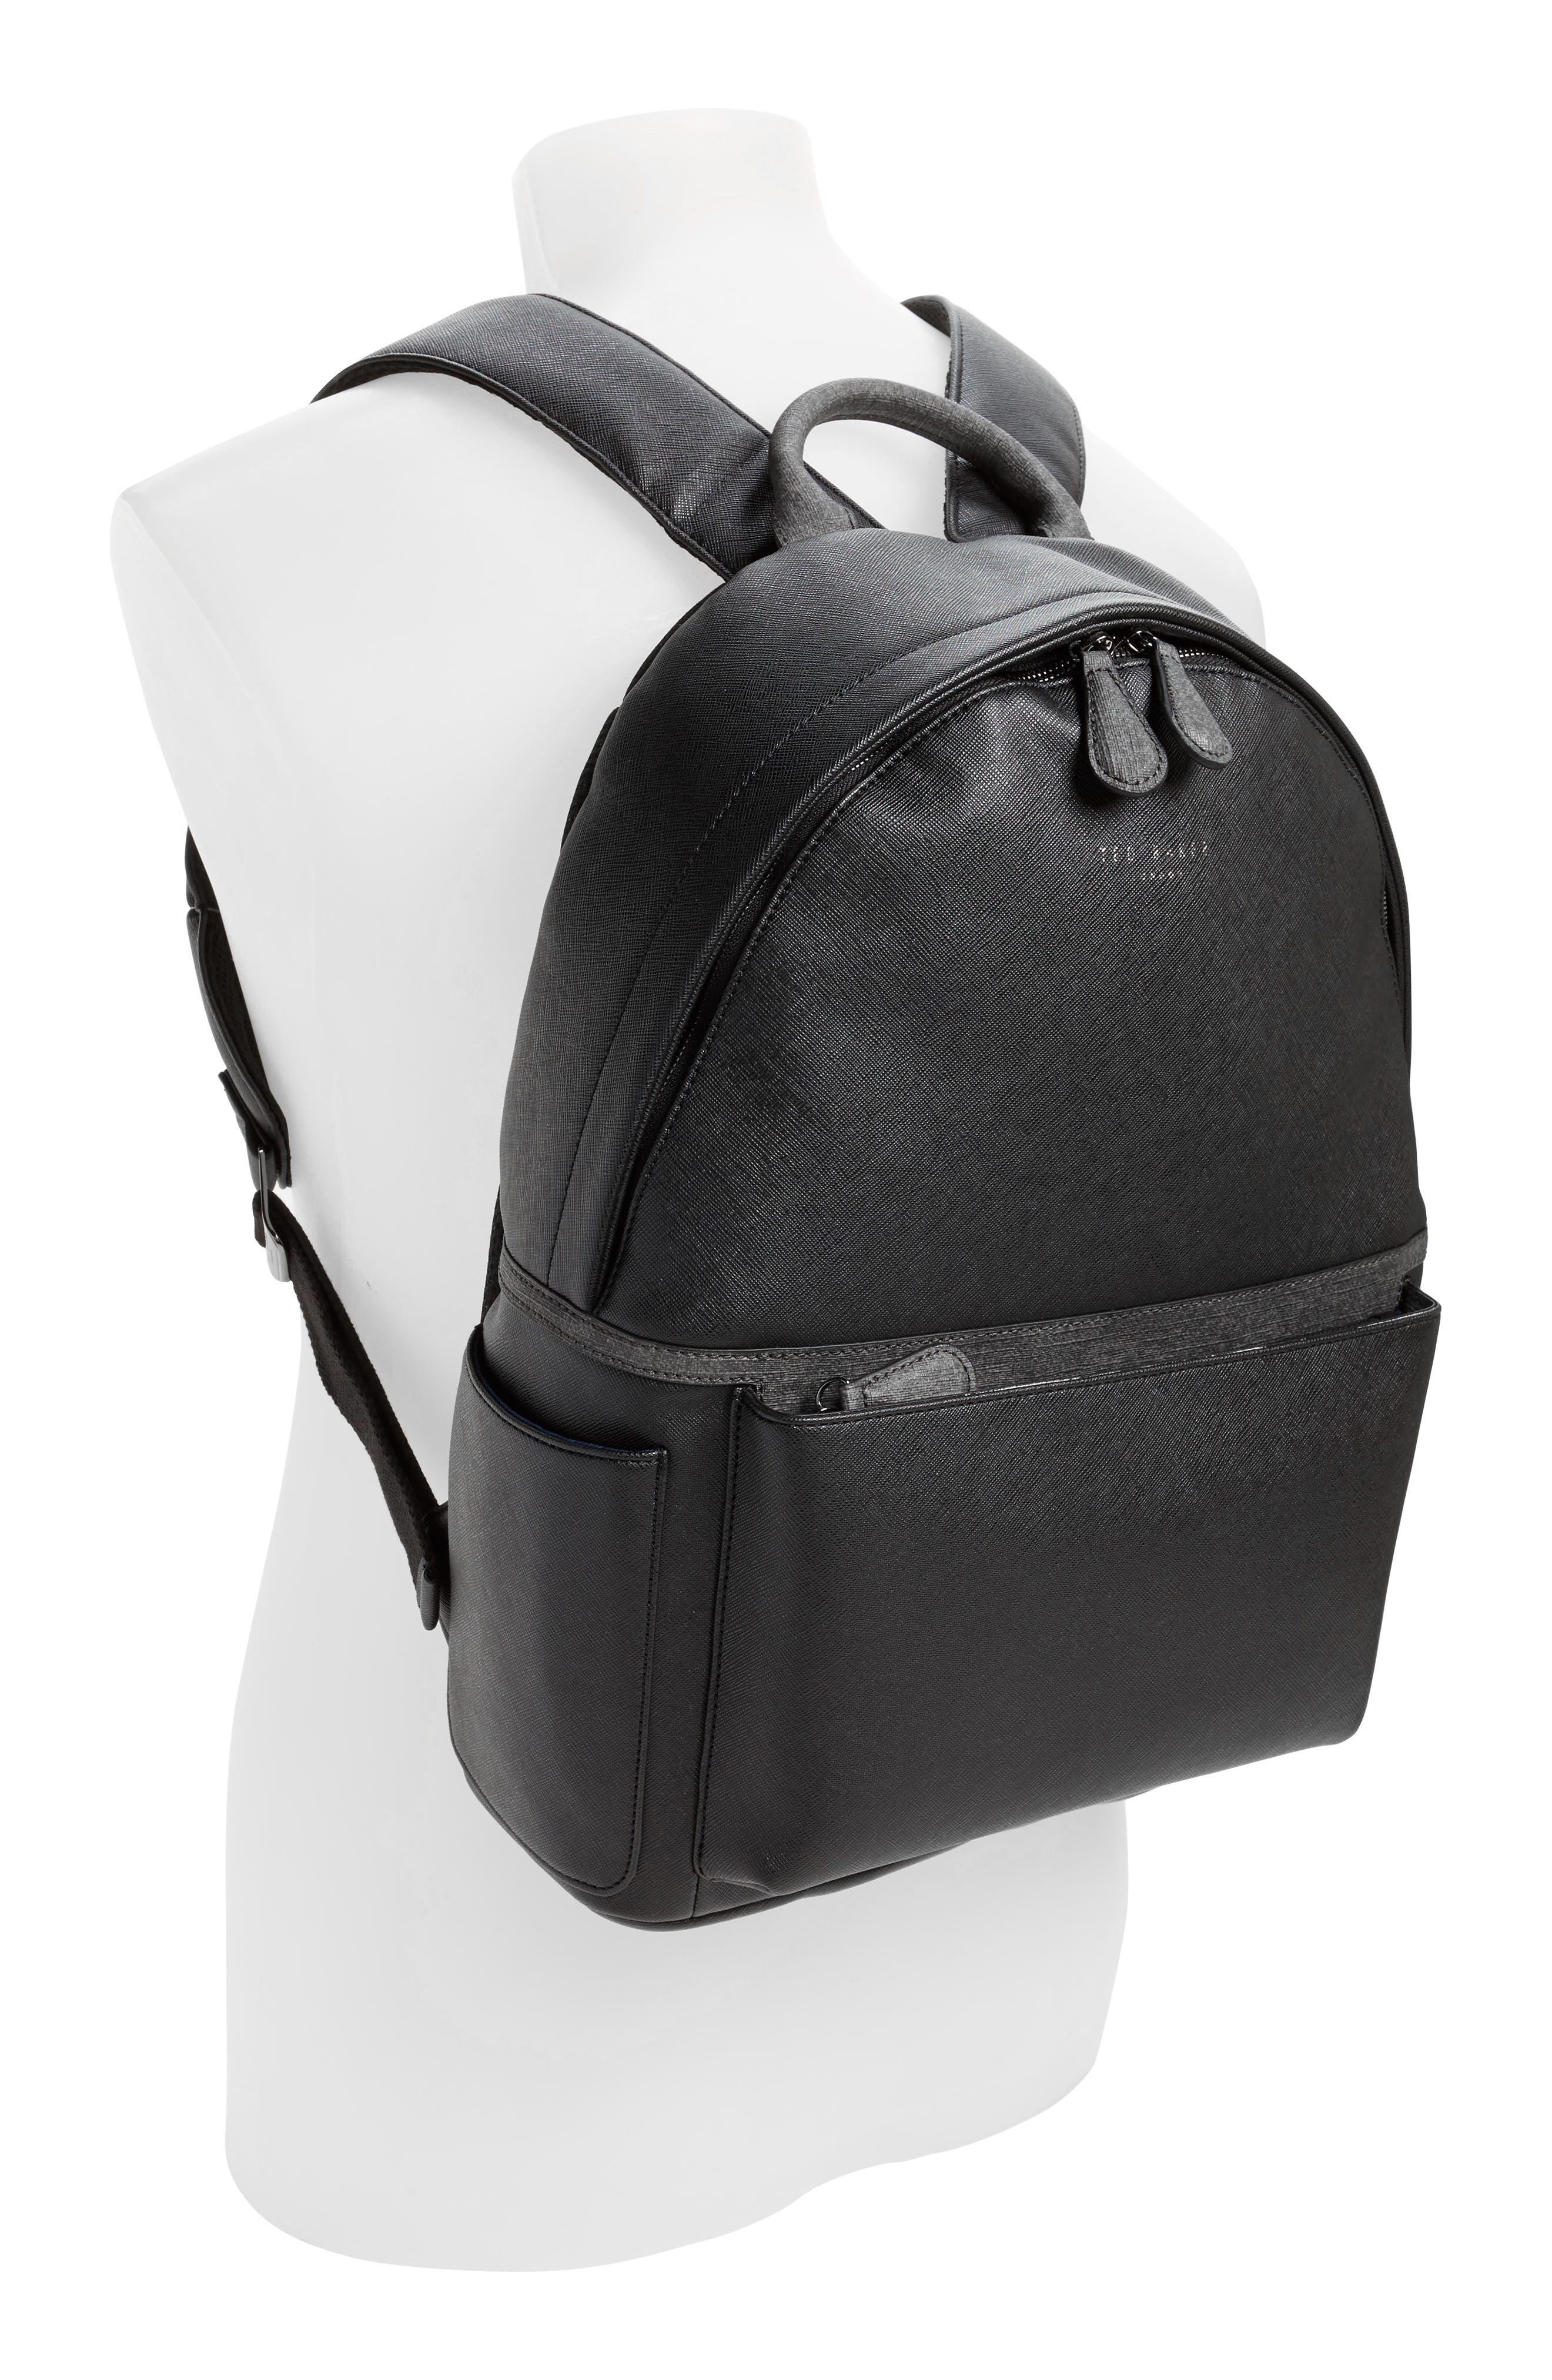 Fangs Backpack,                             Alternate thumbnail 2, color,                             Black